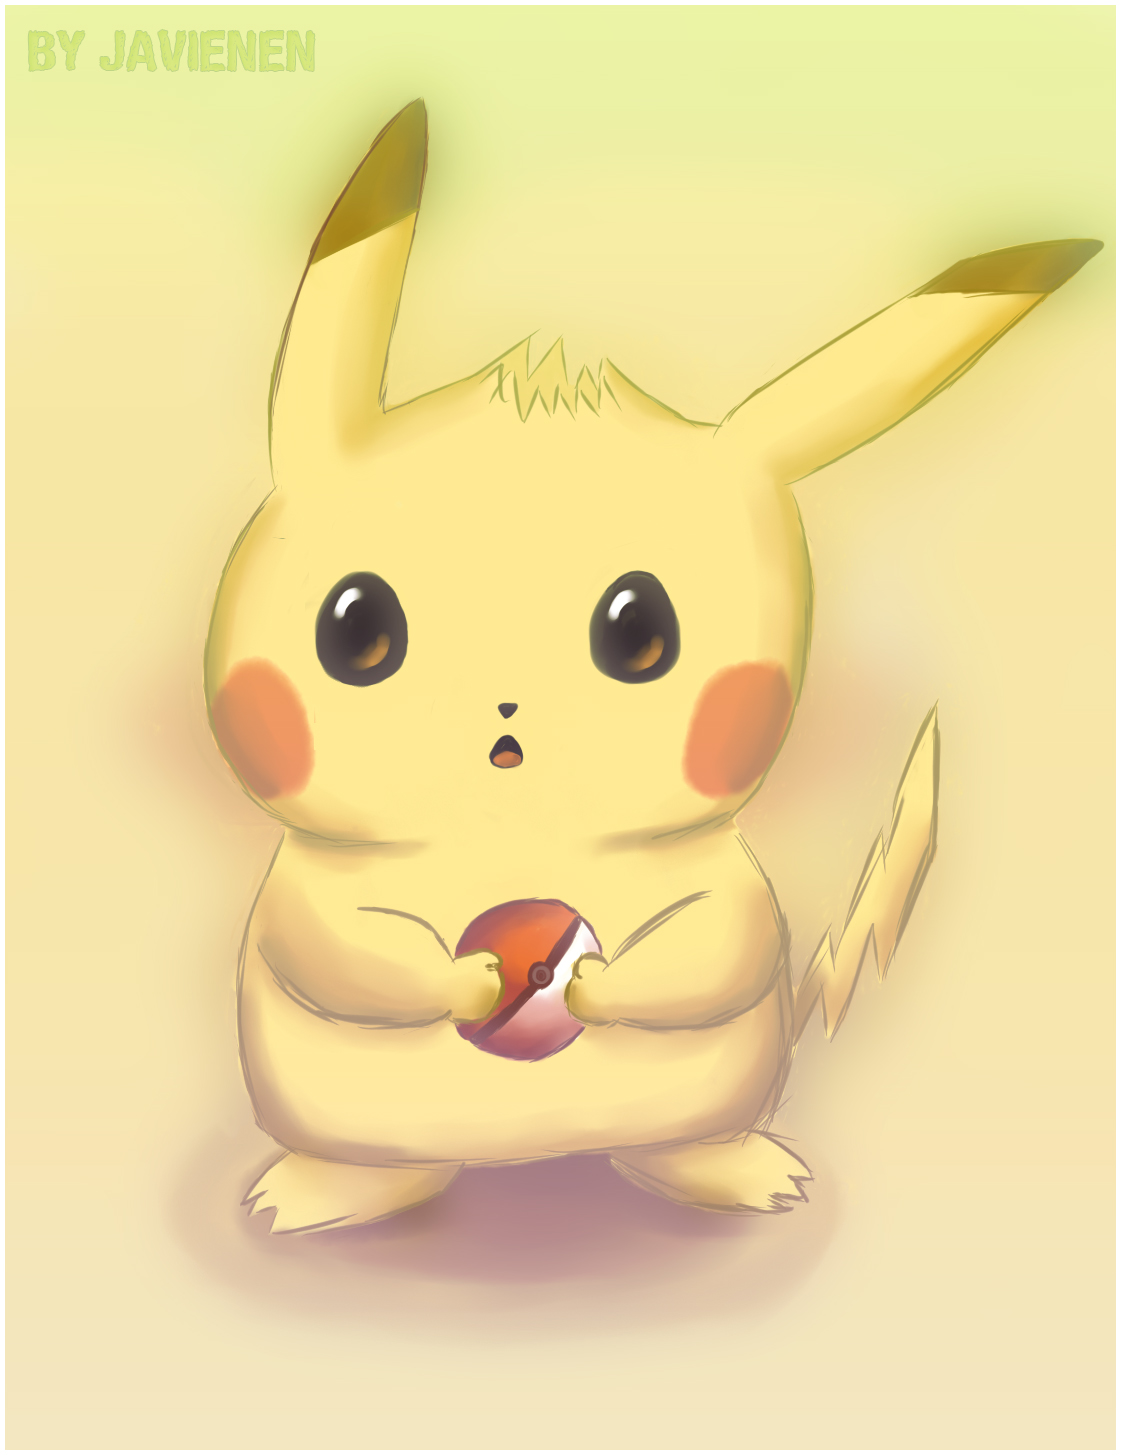 Cute Pikachu by Javienen on DeviantArt